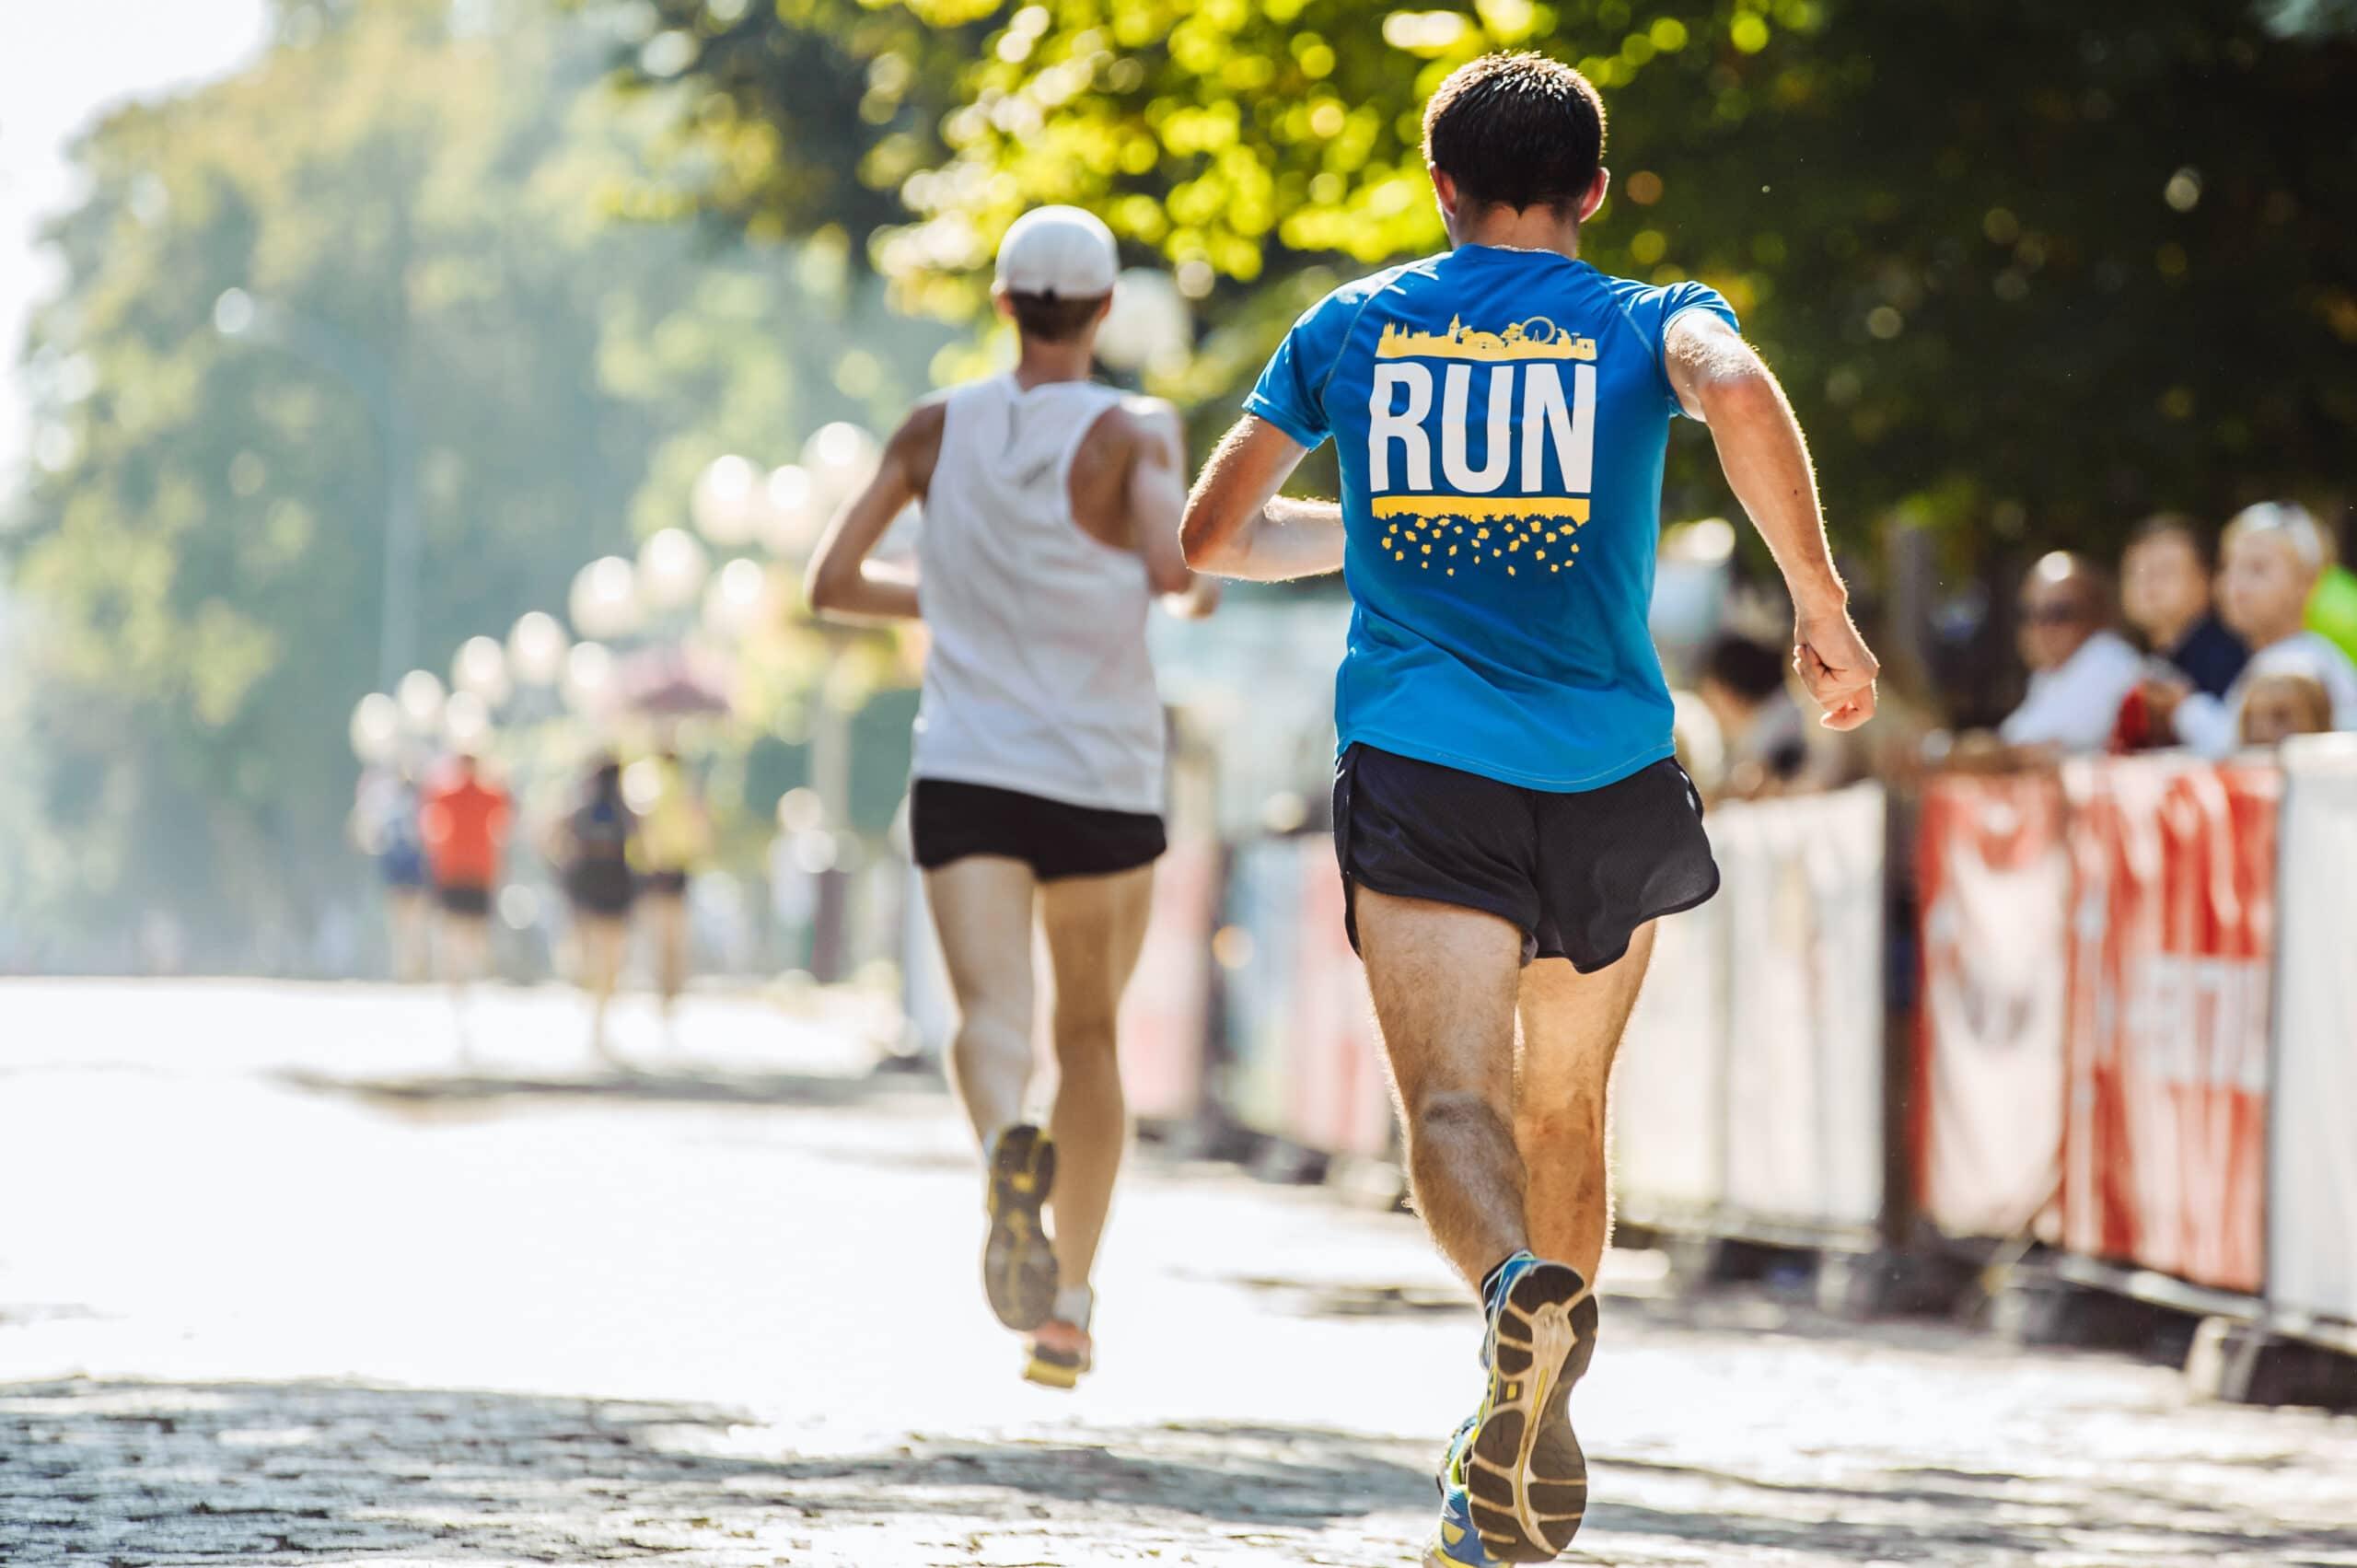 Para Runners: Soluciona el dolor de pies